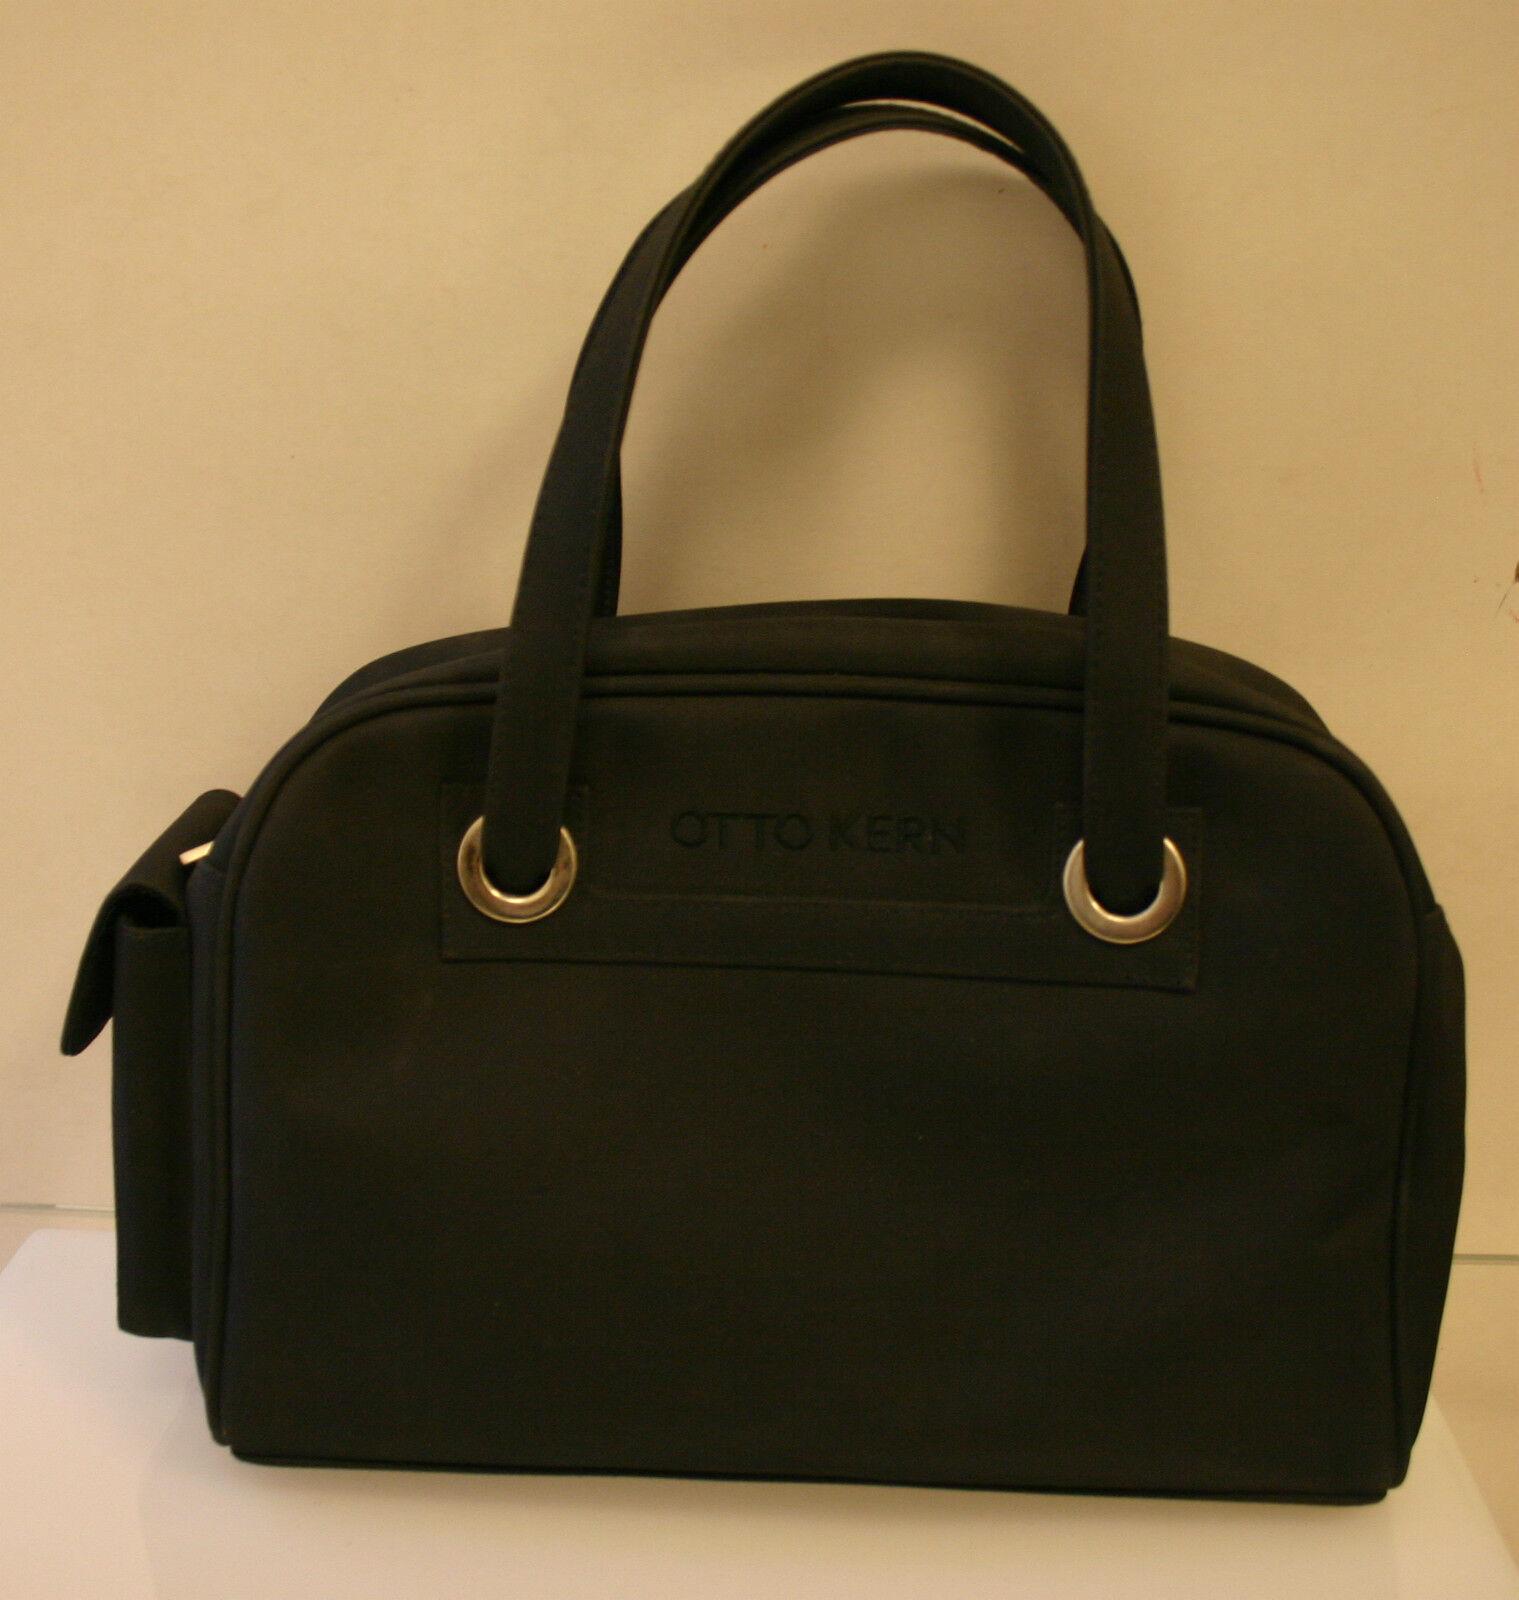 otto kern tasche gro e handtasche shopper nylon schwarz. Black Bedroom Furniture Sets. Home Design Ideas